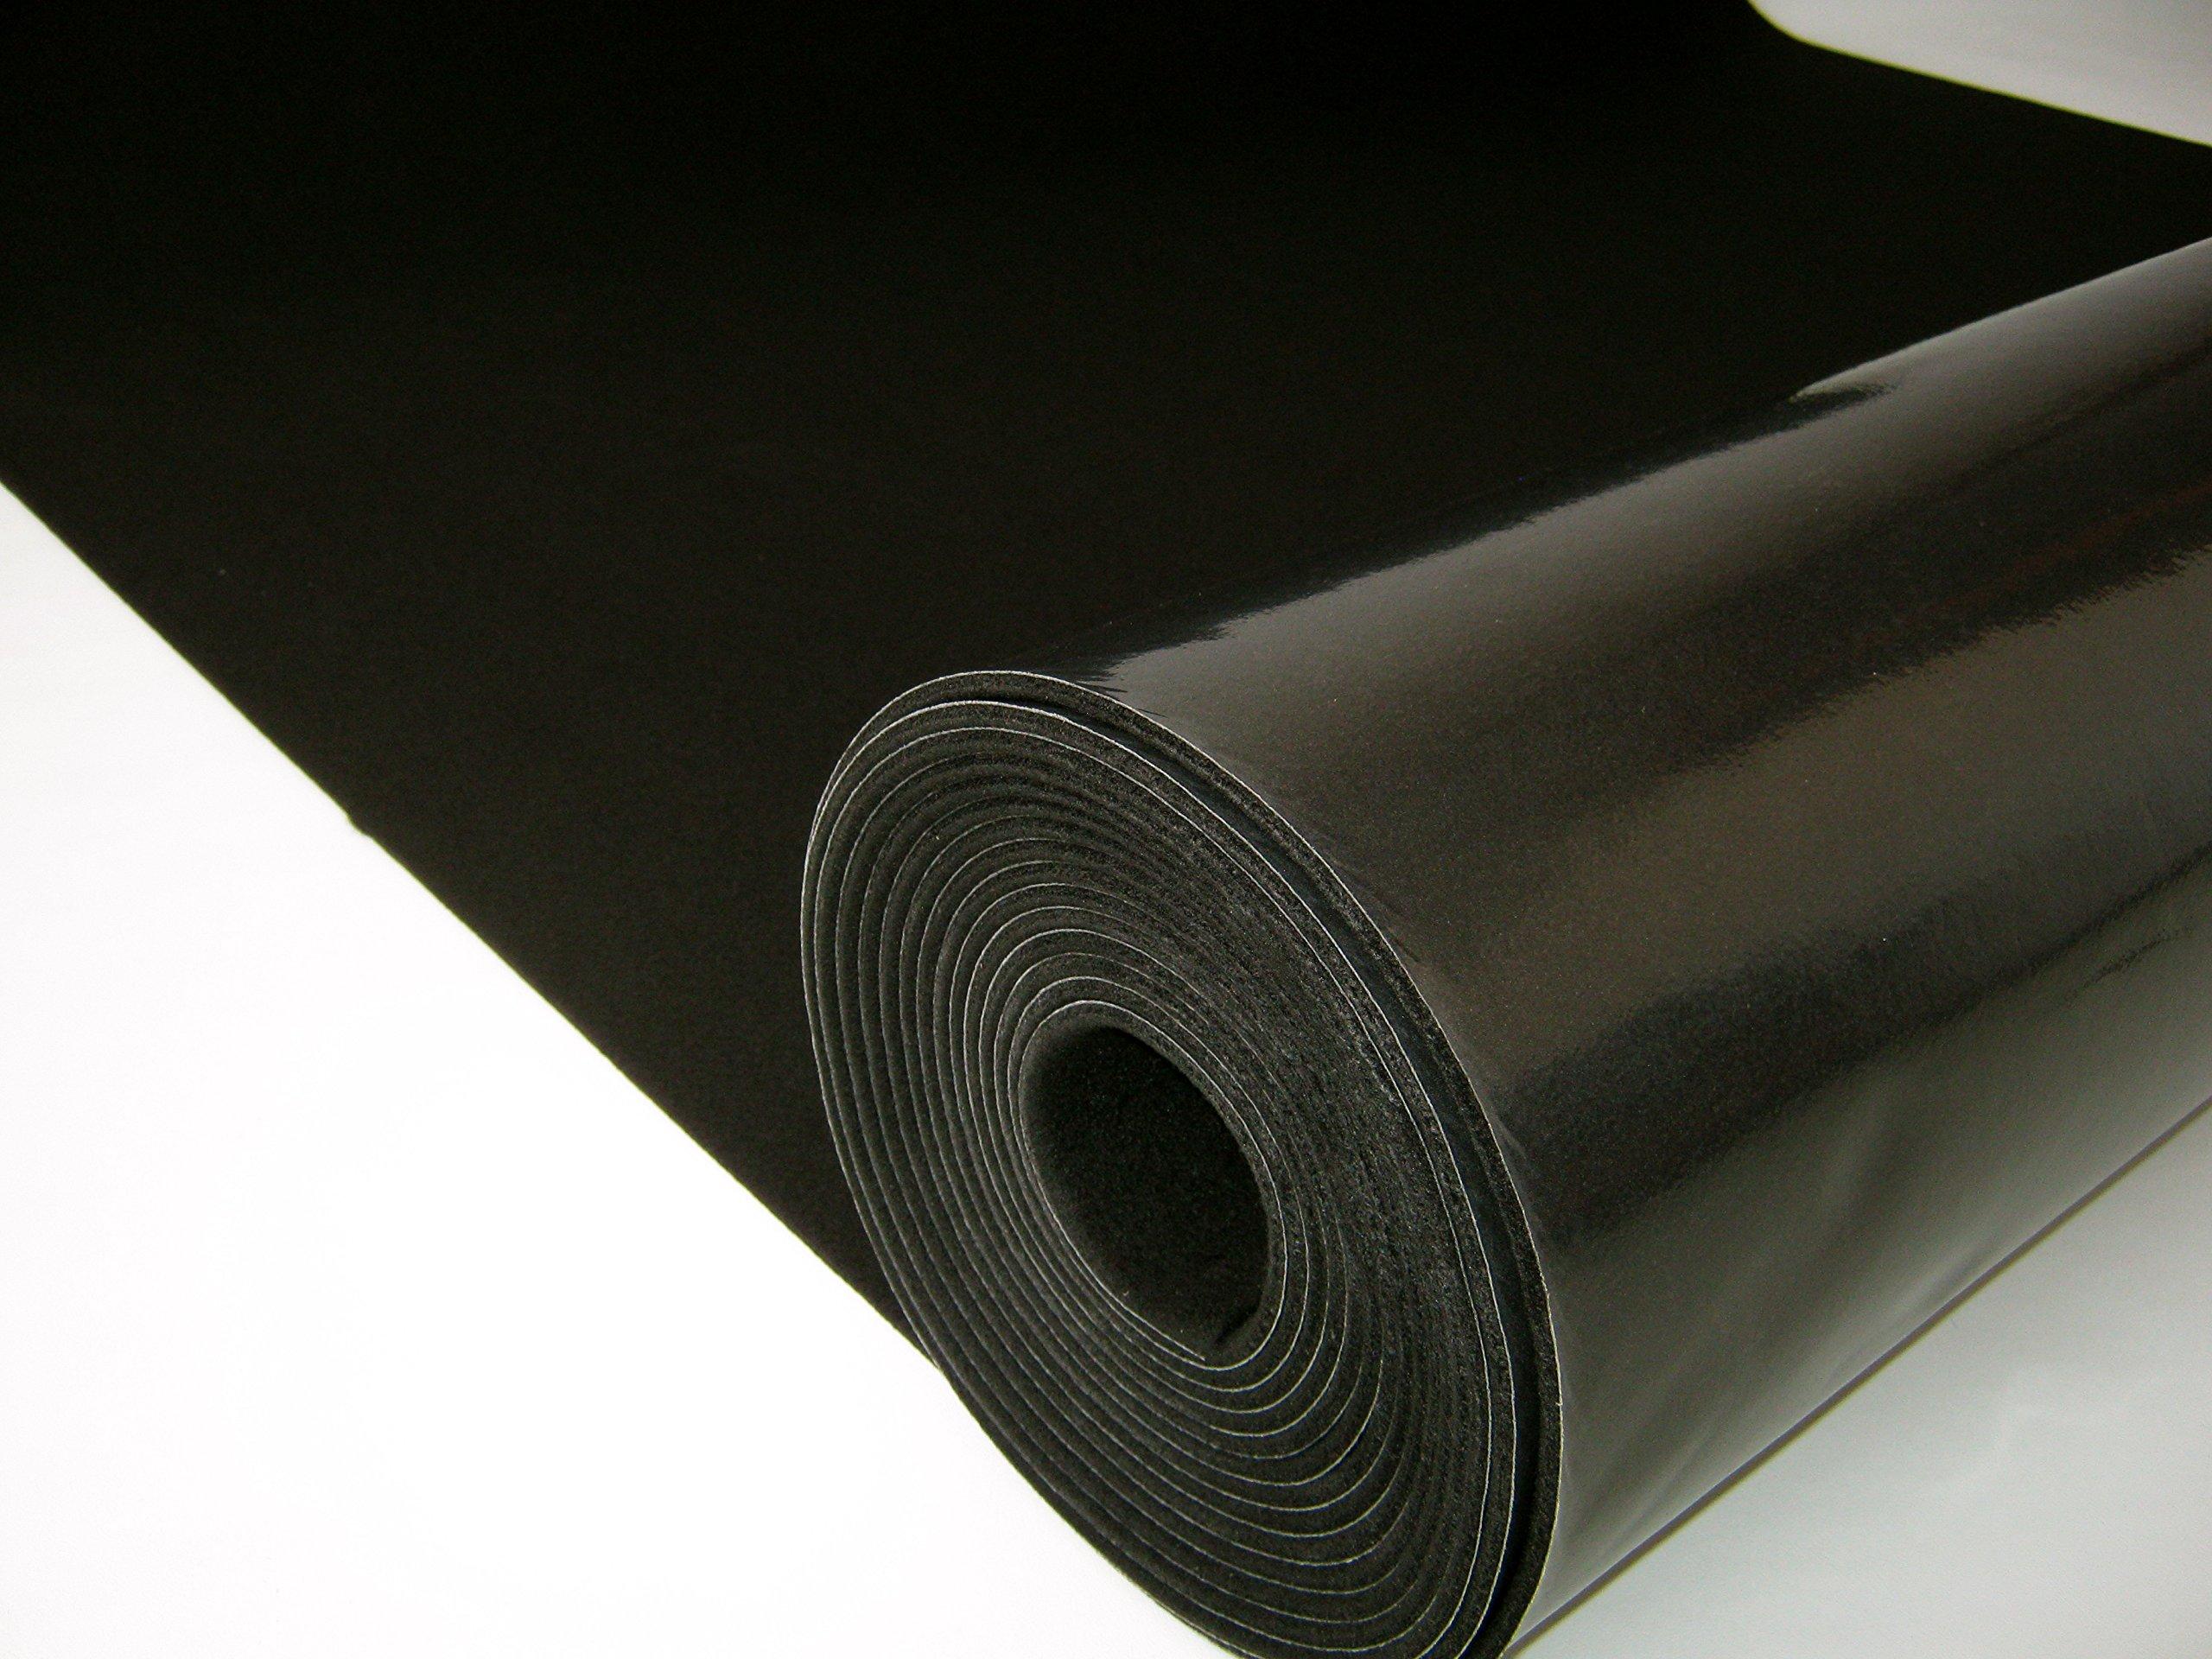 MuteX Soundproof Material (Black, 10 sqft, 5'x2')